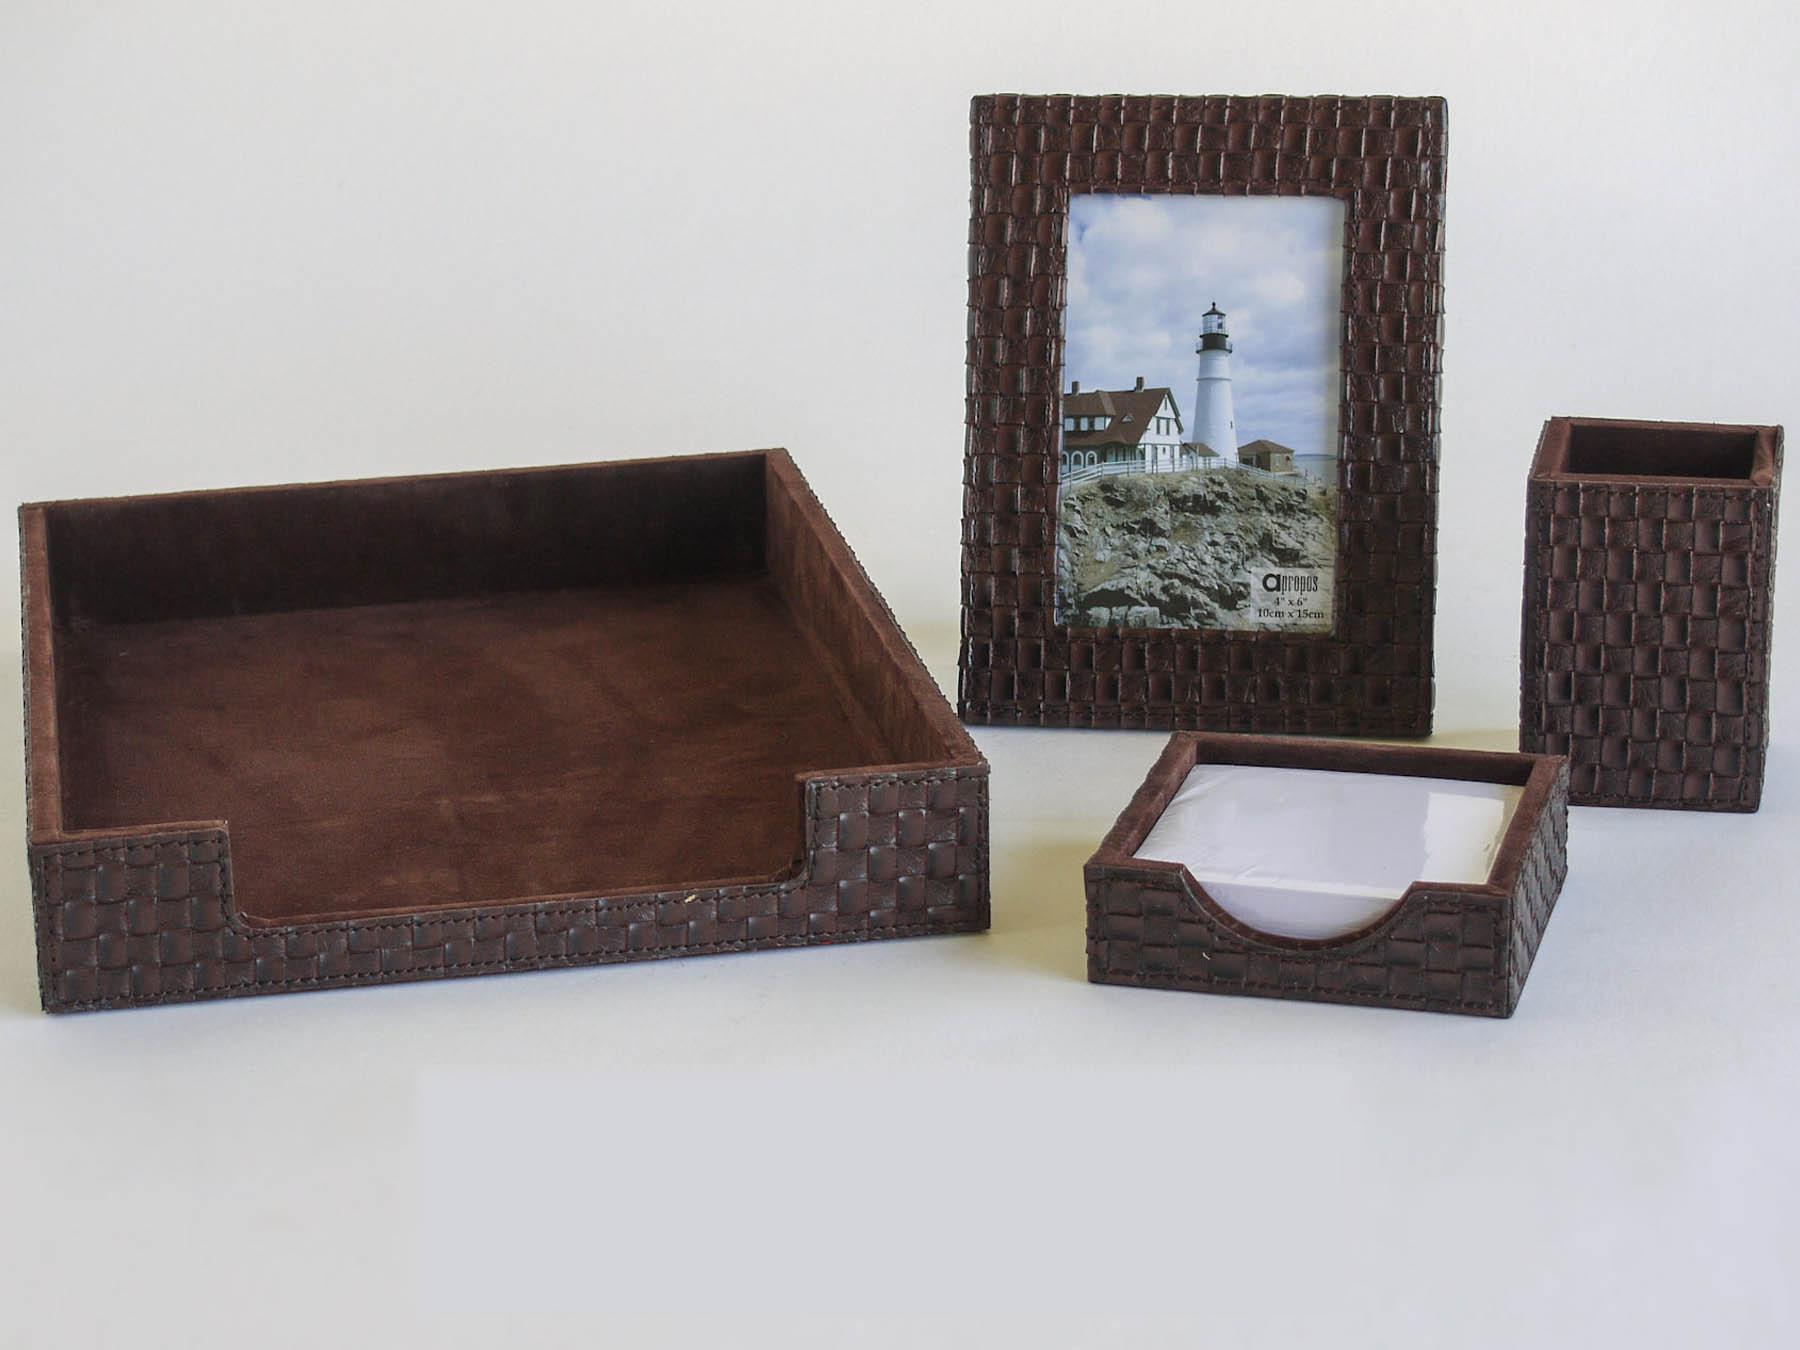 4 piece faux leather desk sets organizer ebay - Leather desk organizer set ...